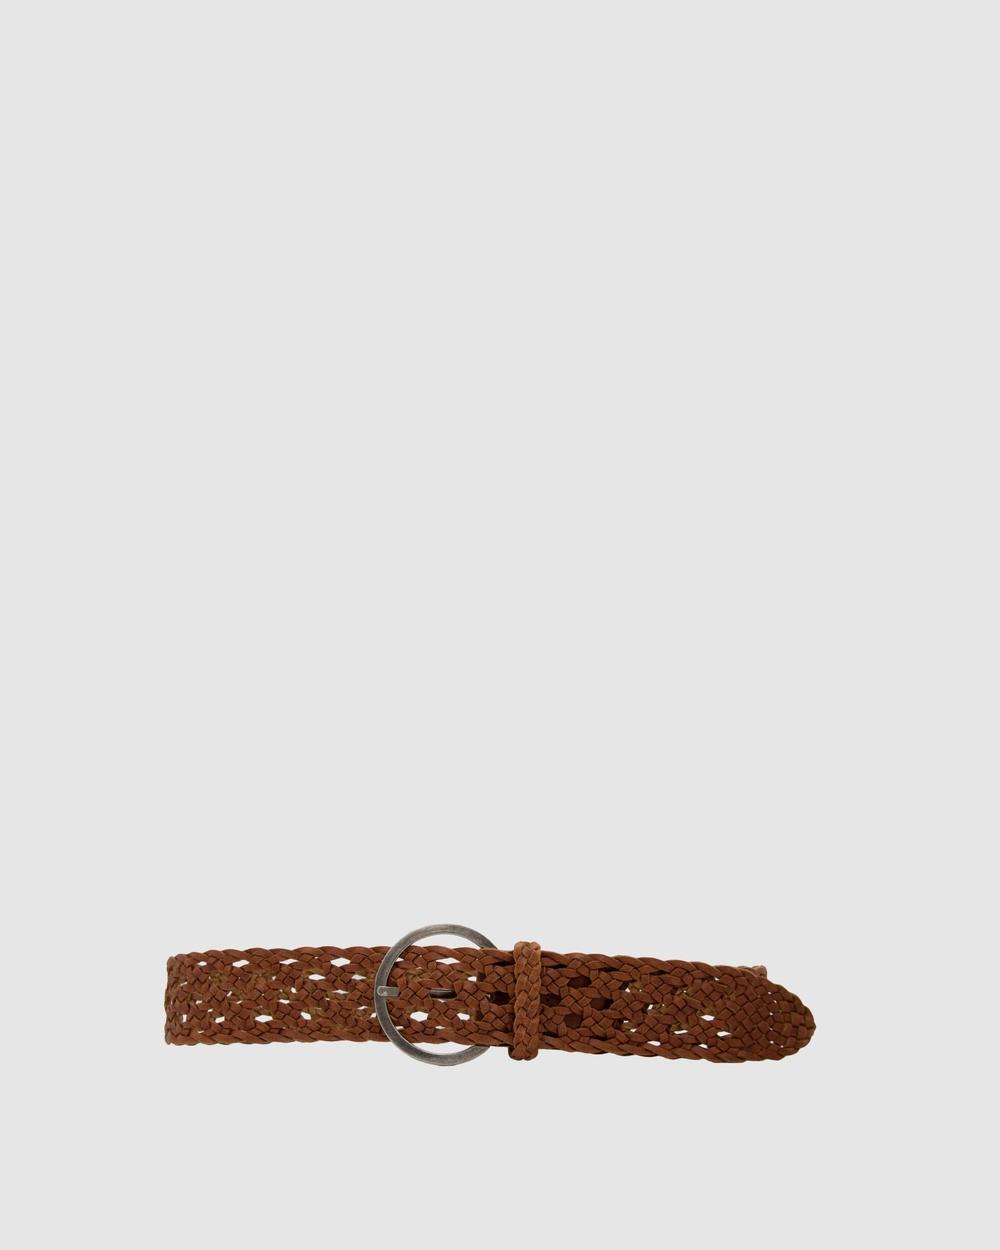 Loop Leather Co Boston Braid Belts Dark Tan